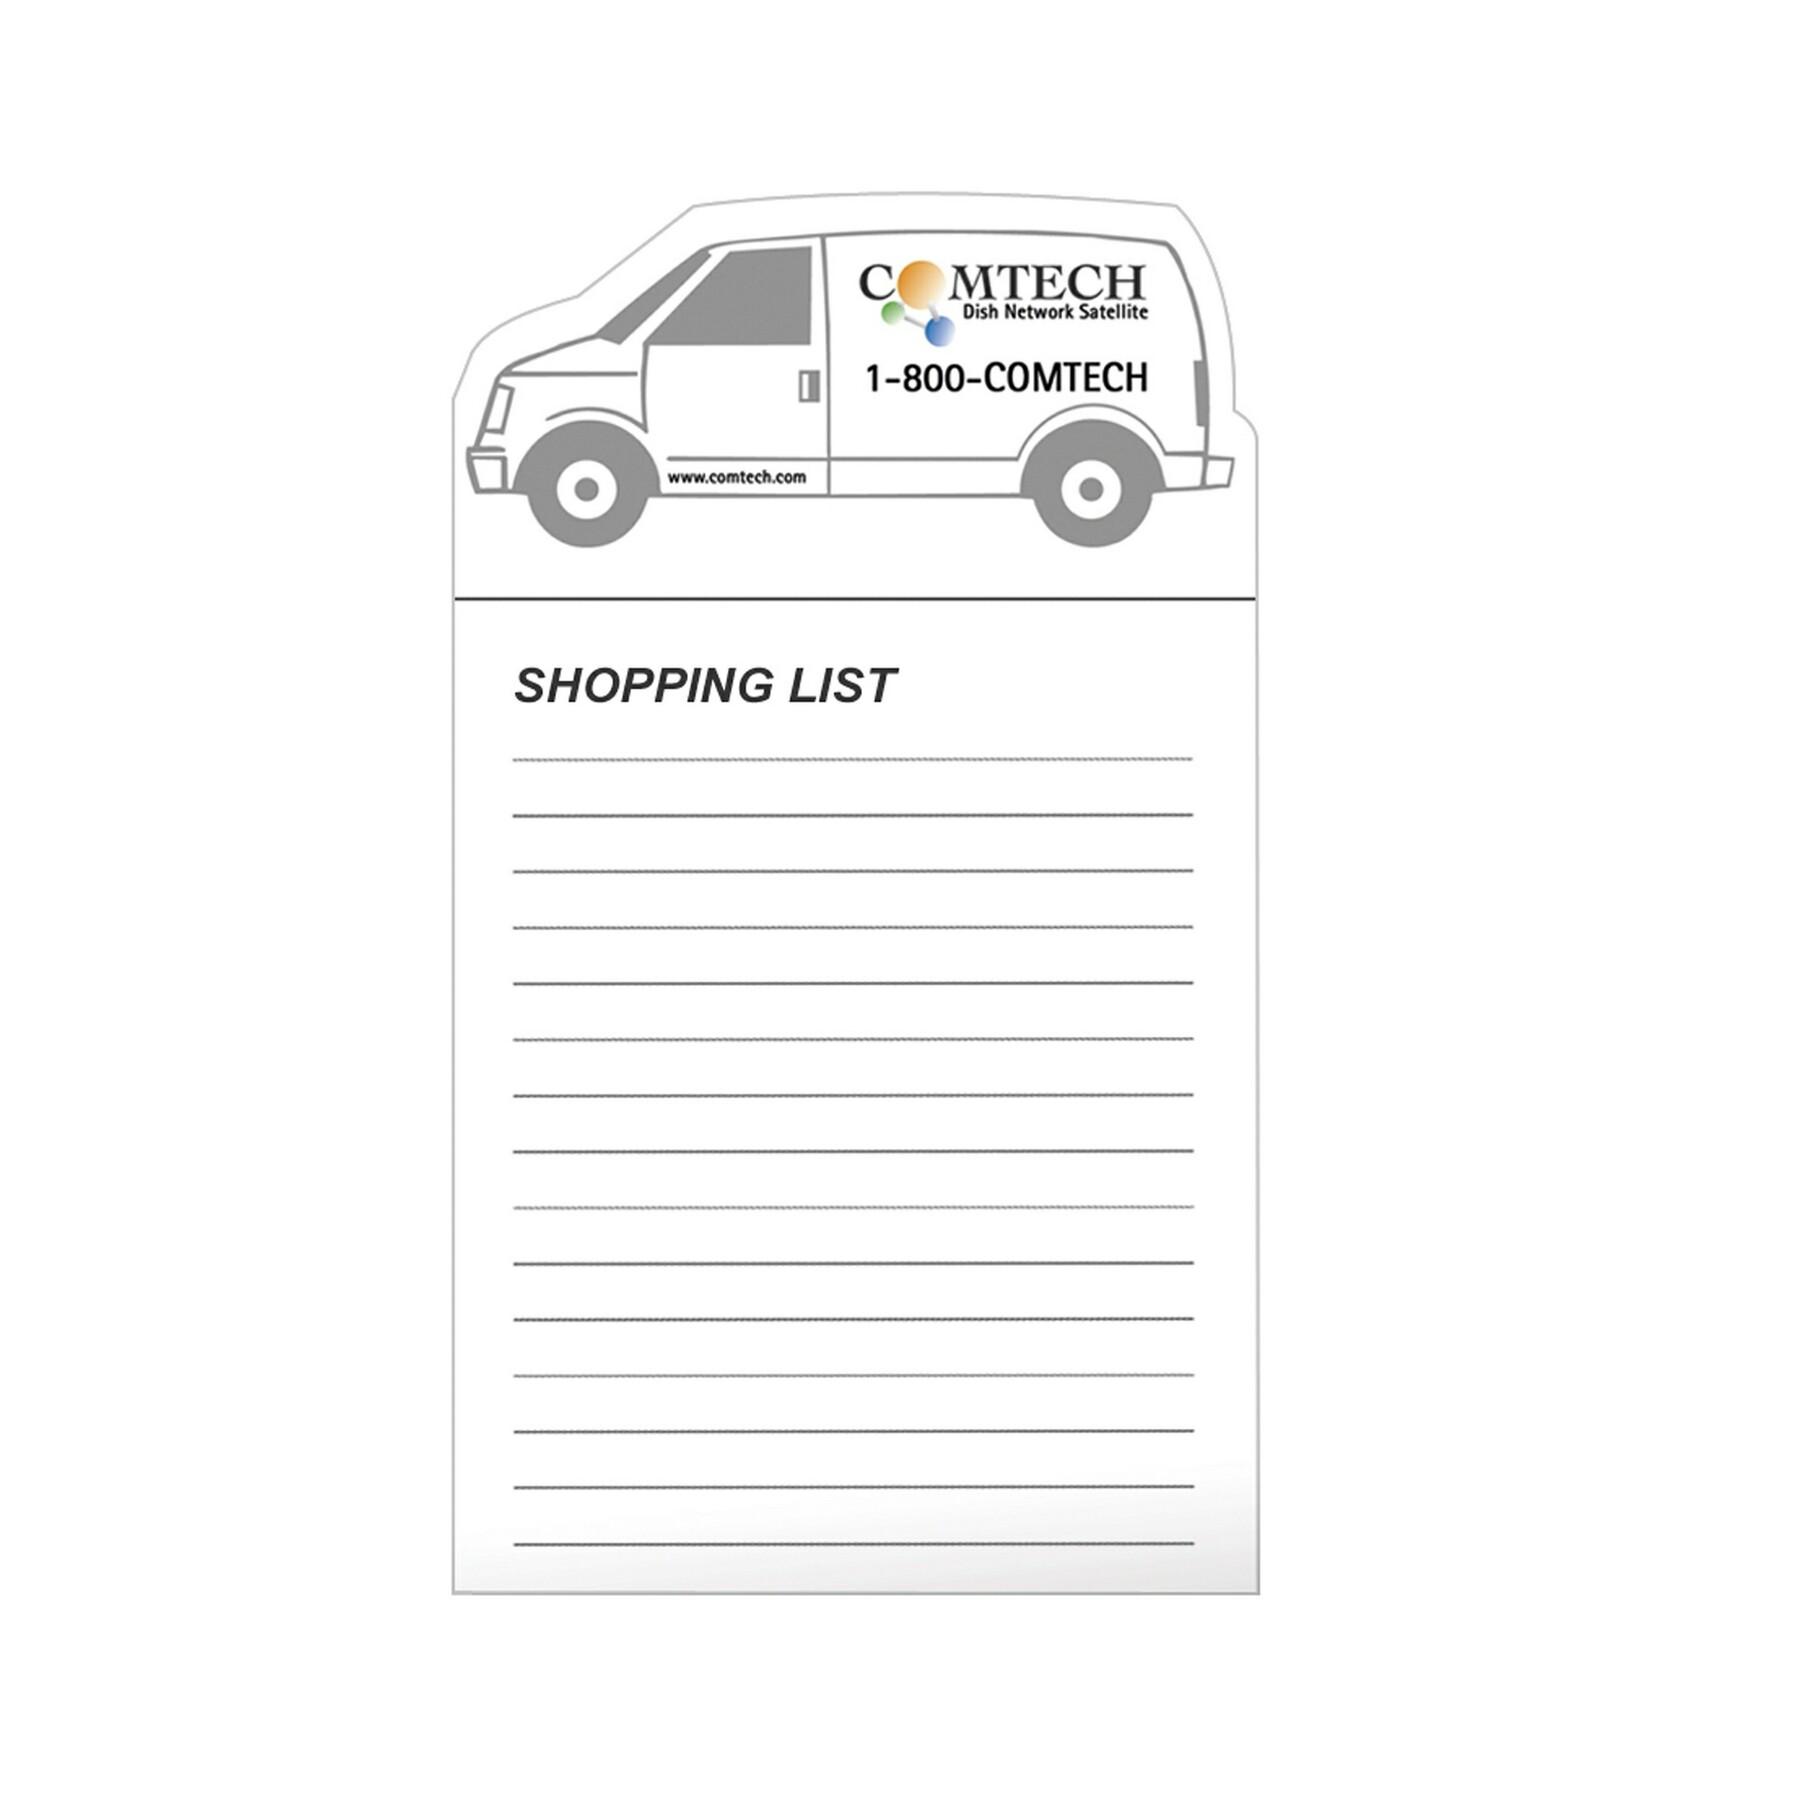 30 Mil Stock Shape Magnet & 50 Sheet Non Adhesive Notepad - Full Colour Imprint